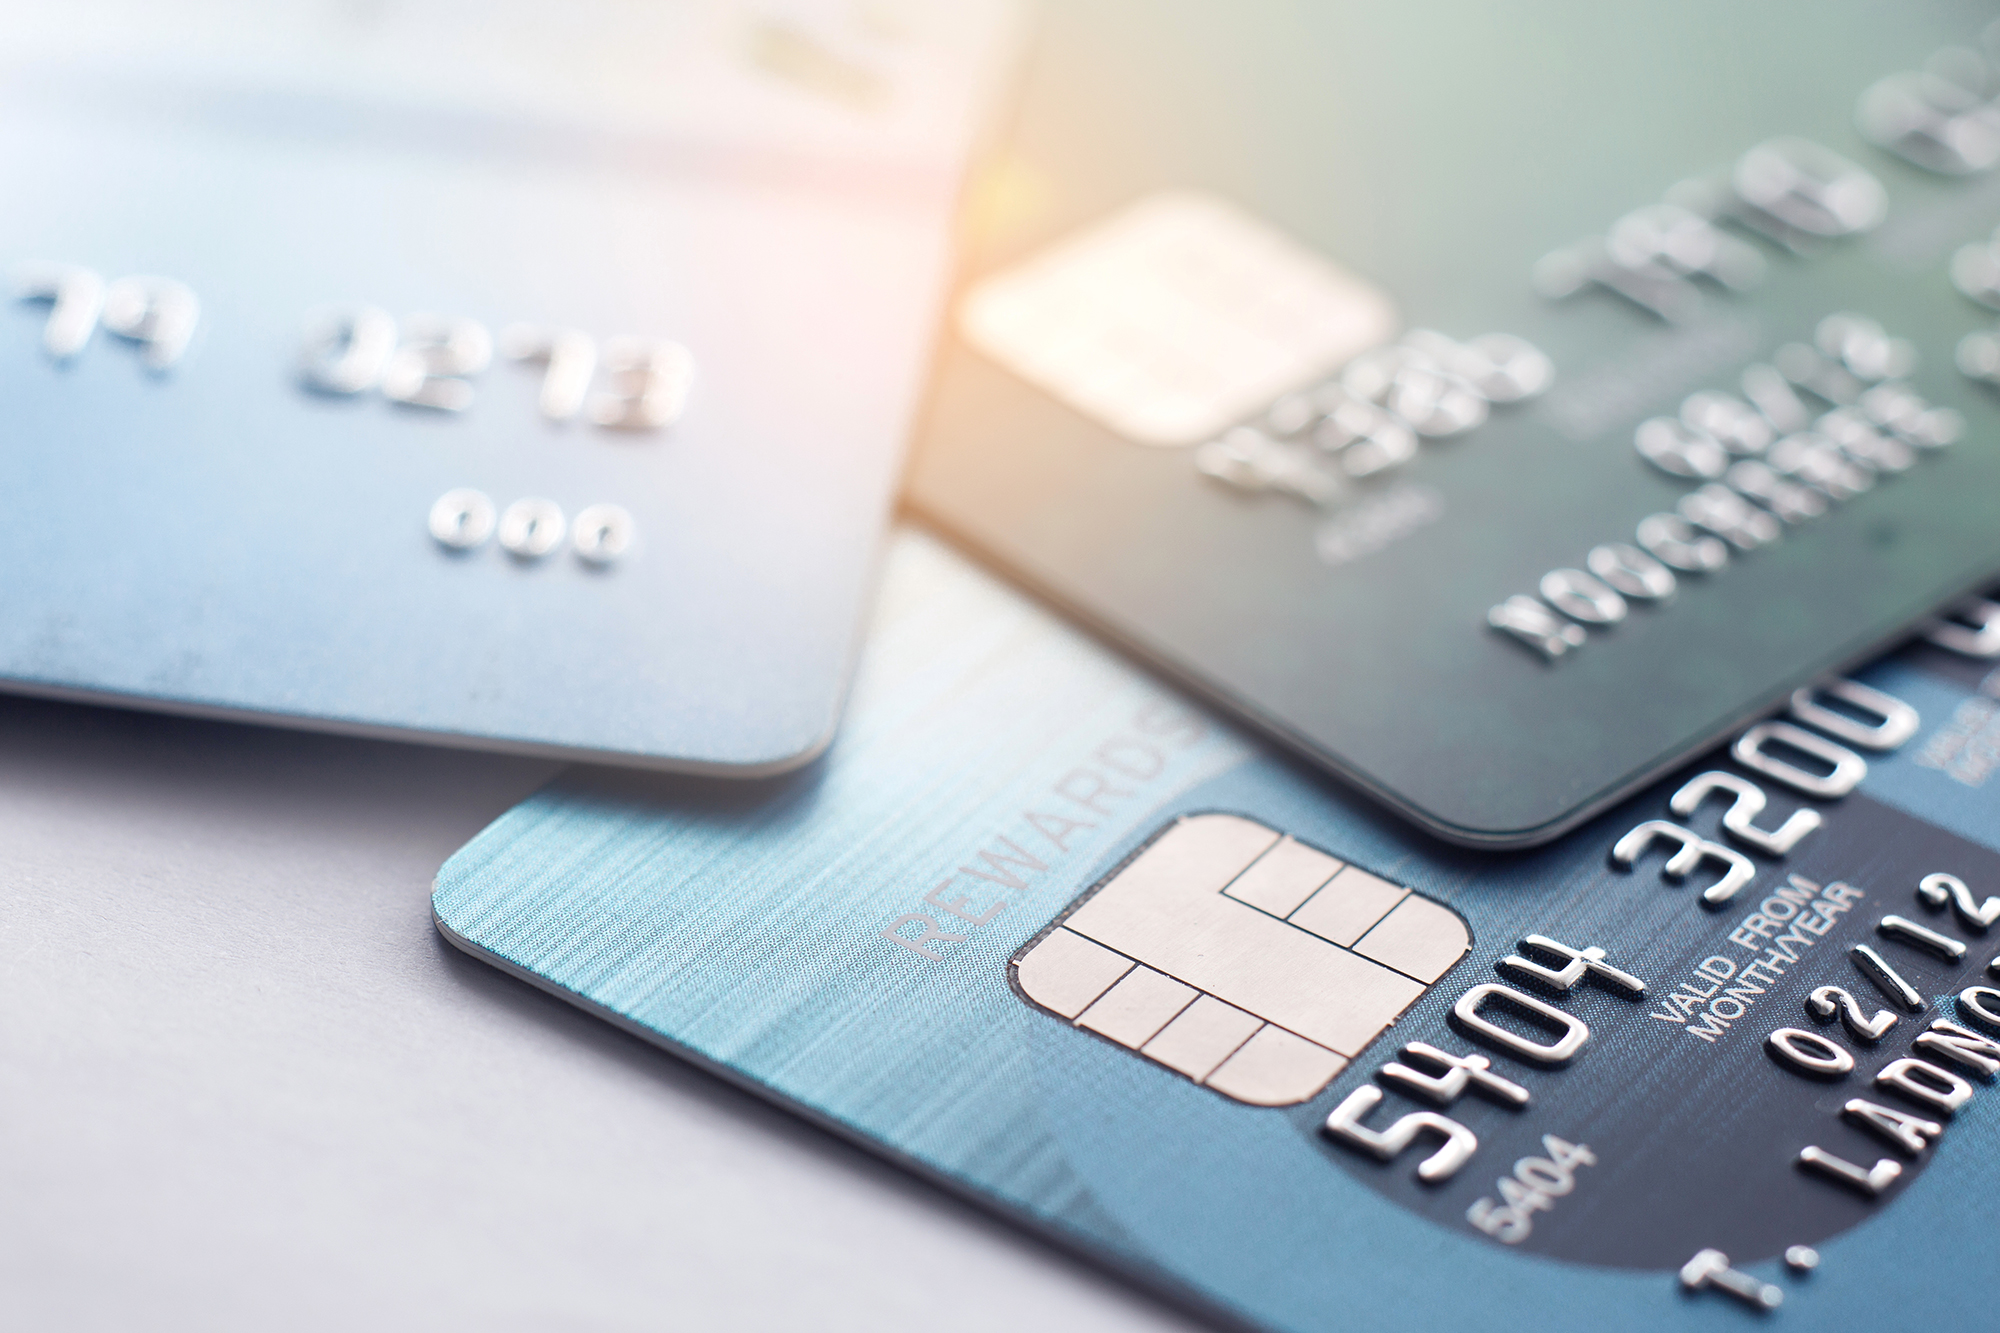 Debit cards. (Image: Shutterstock)